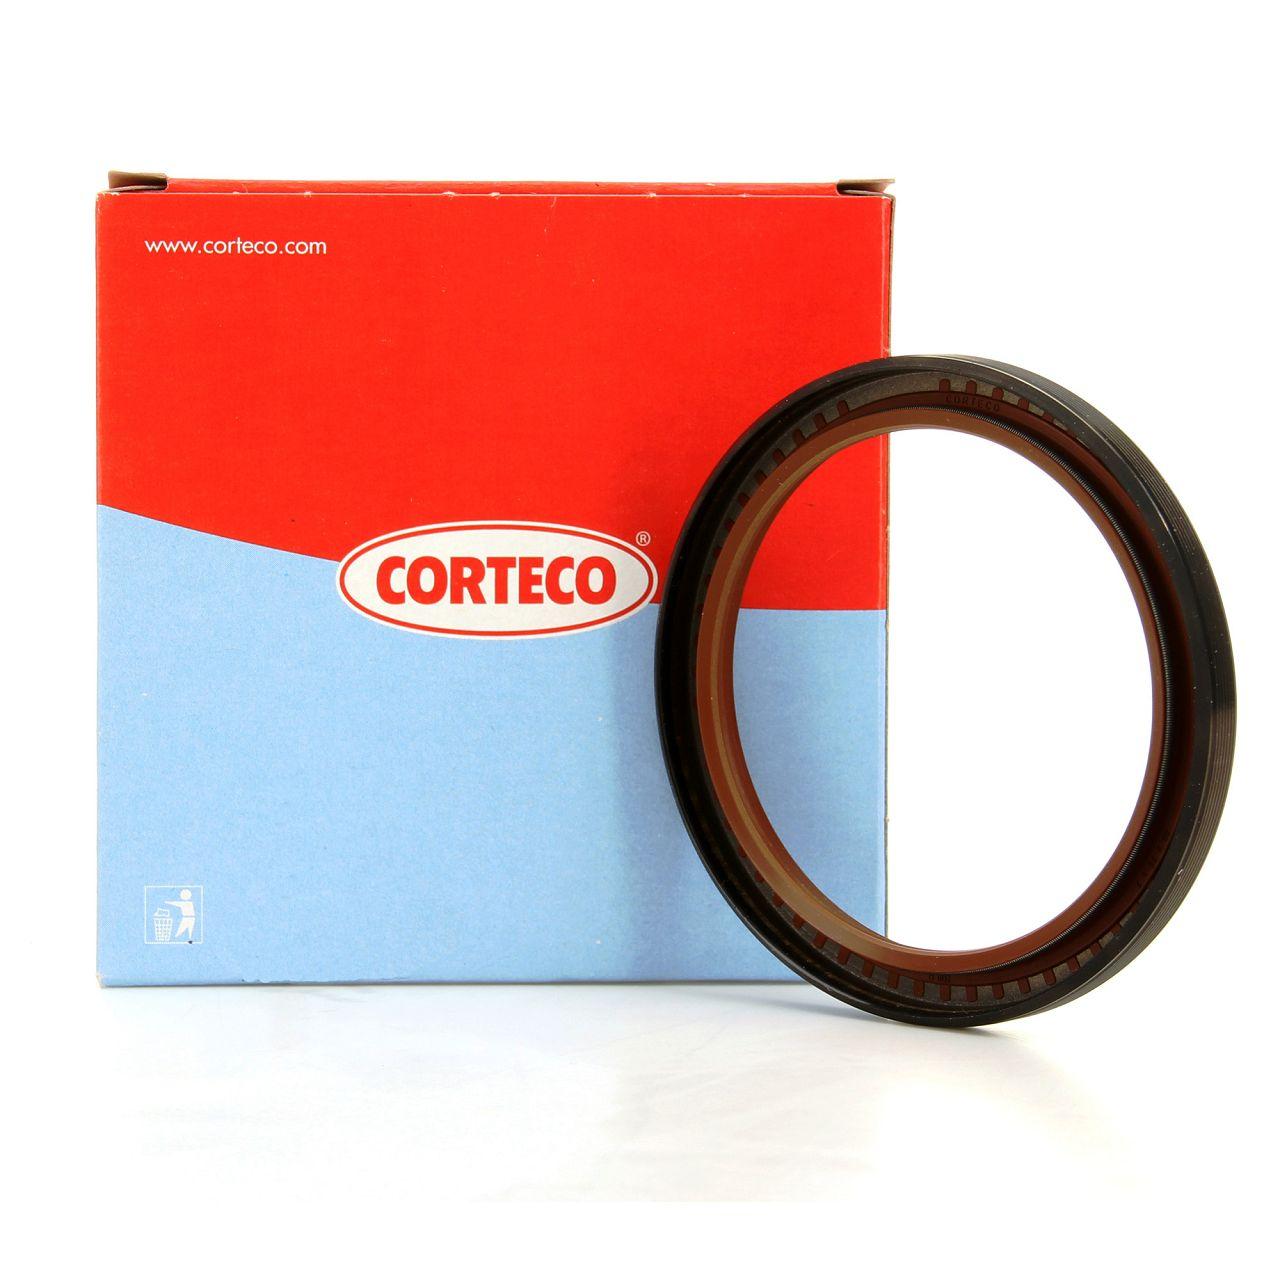 CORTECO Wellendichtring Simmering Kurbelwelle 46085509B